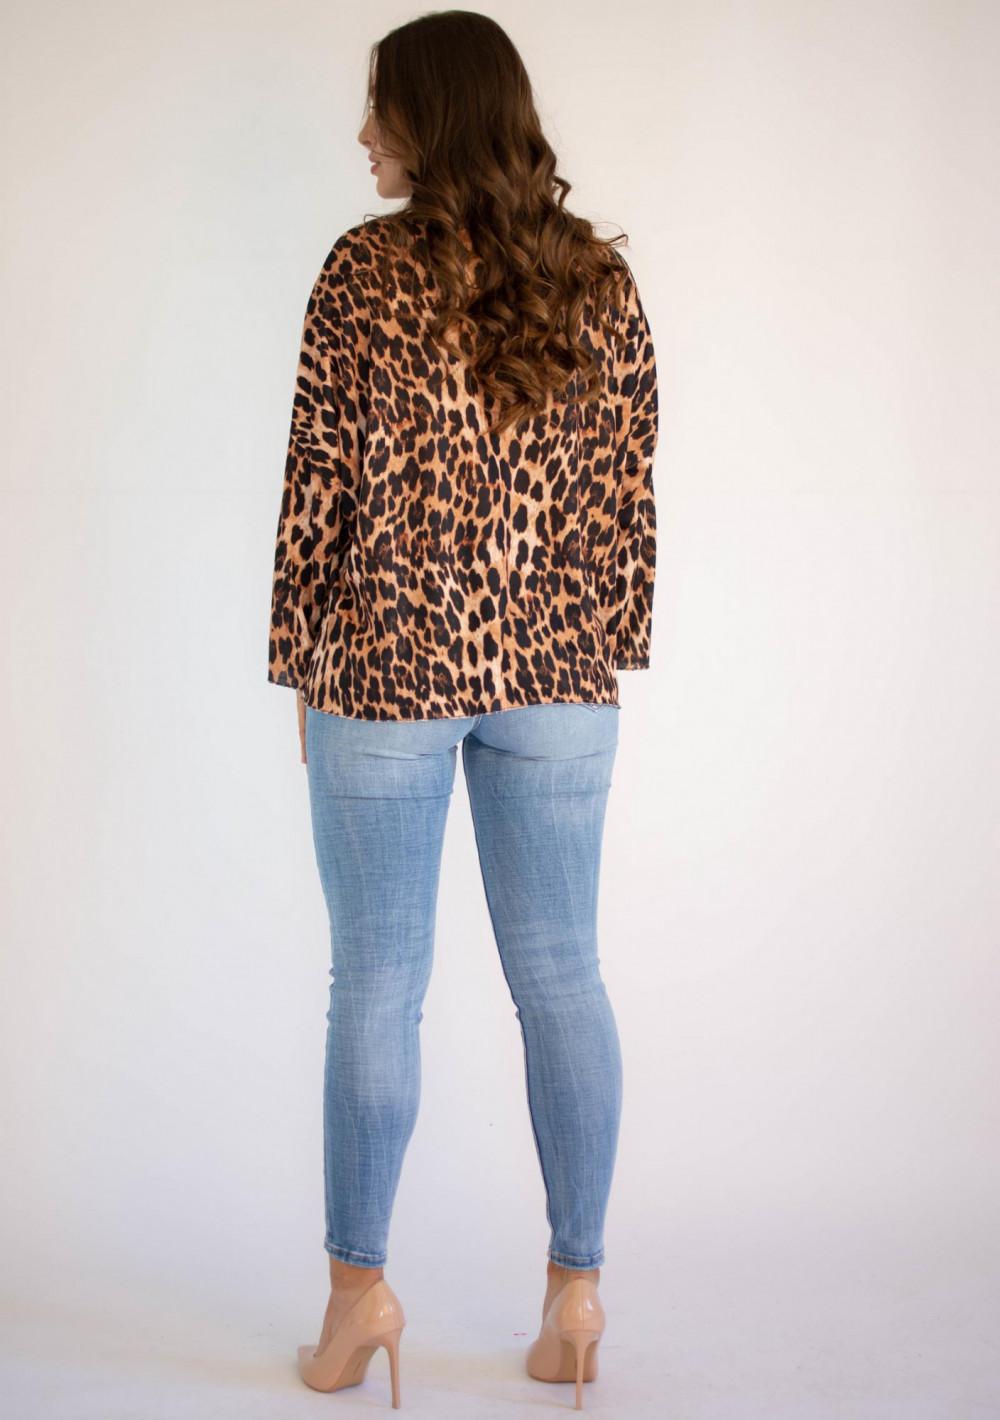 Bluzka damska z długim rękawem panterka Laura 1